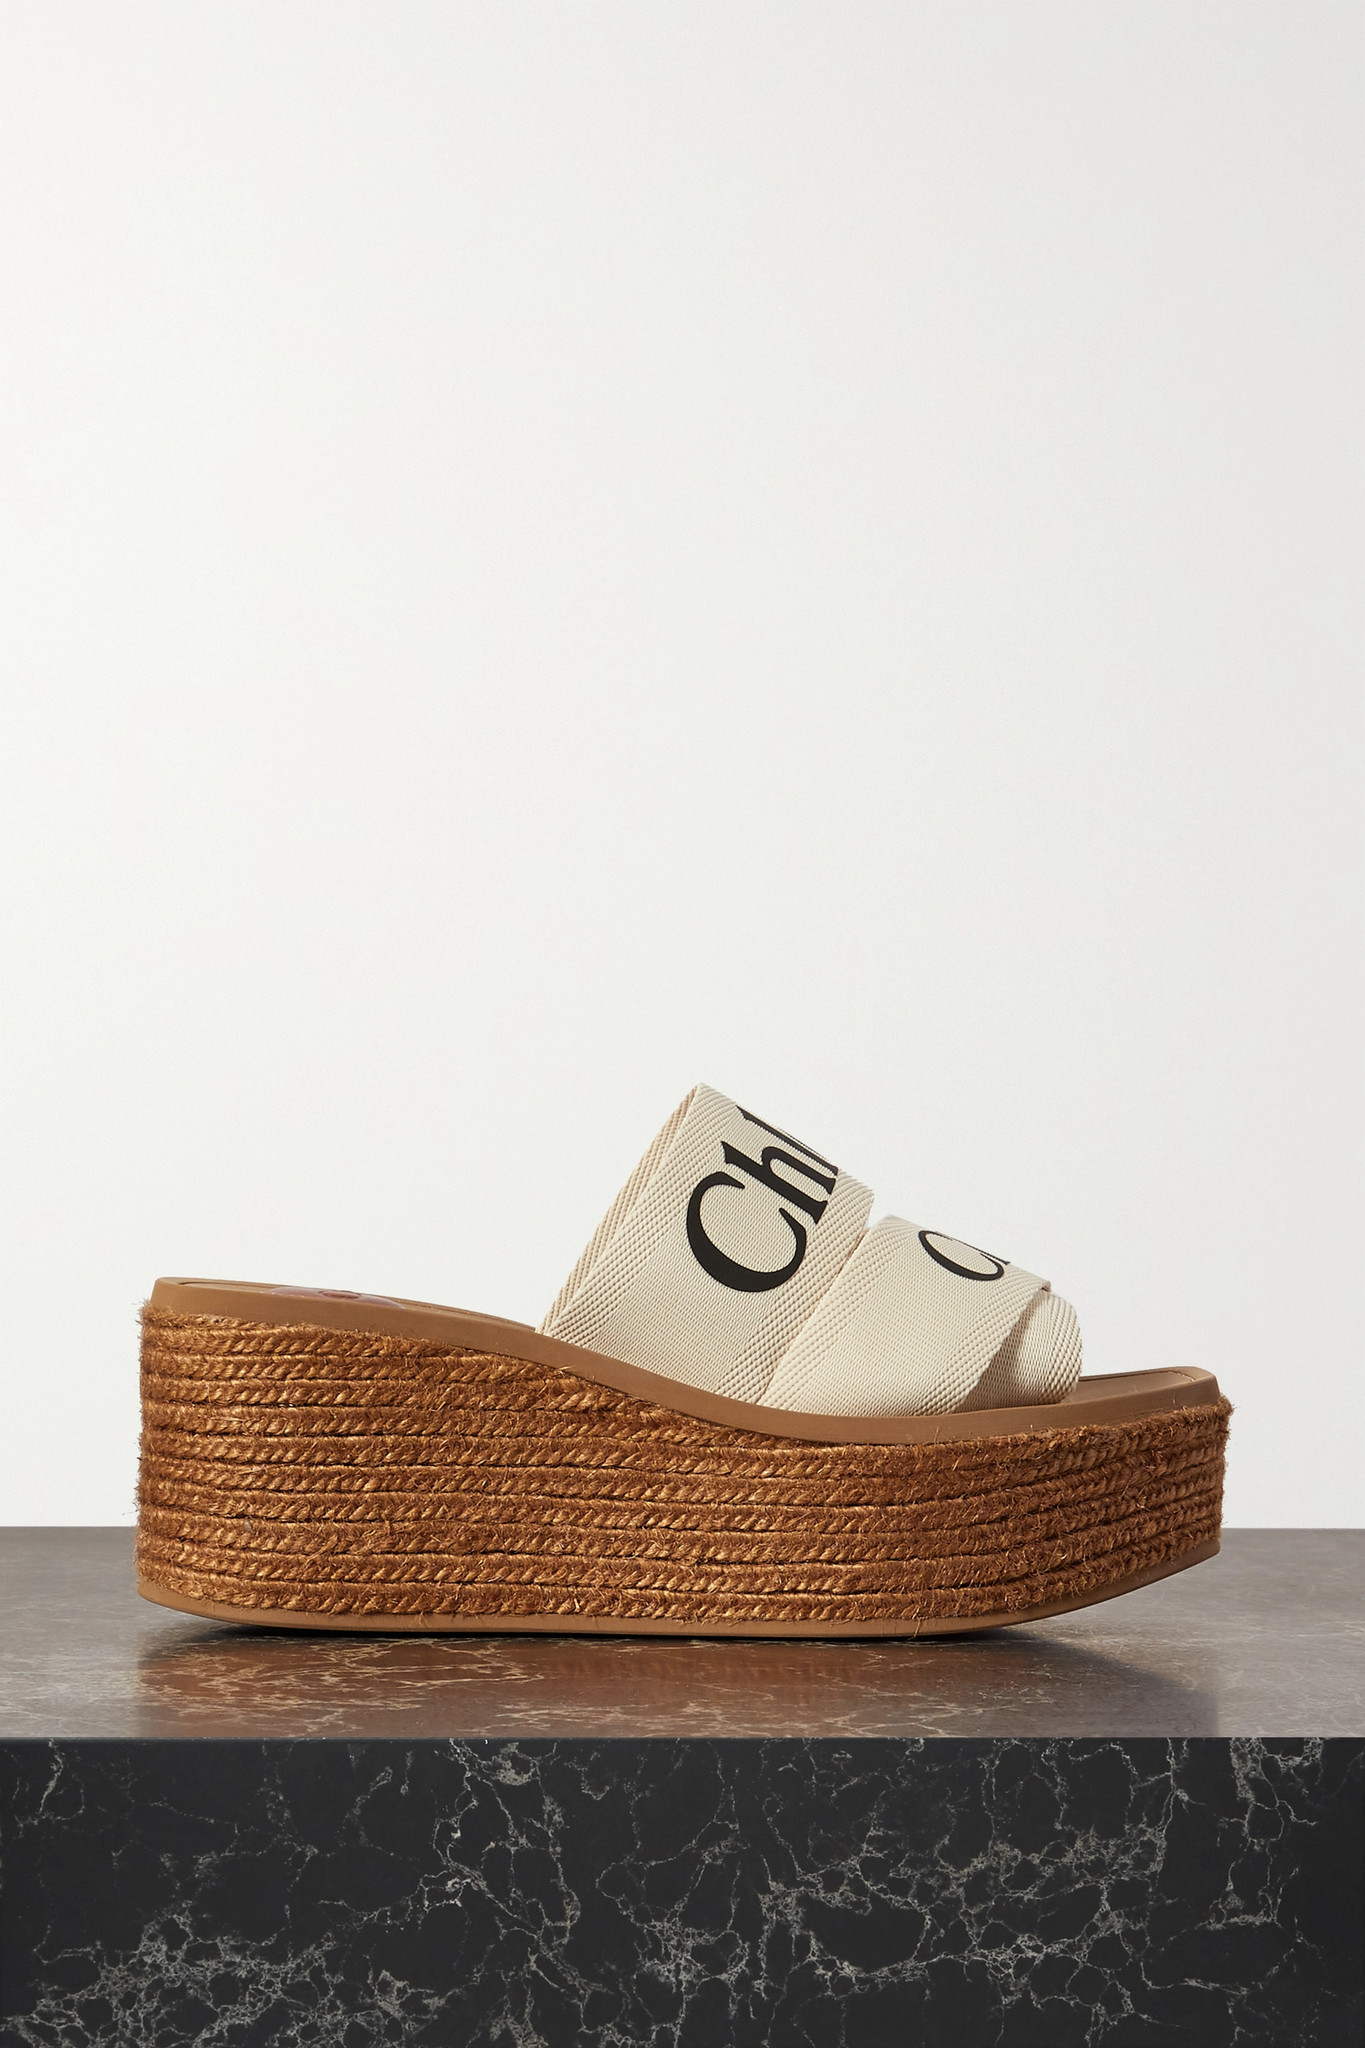 CHLOÉ - Woody 品牌标志印花帆布麻底防水台拖鞋 - 白色 - IT37